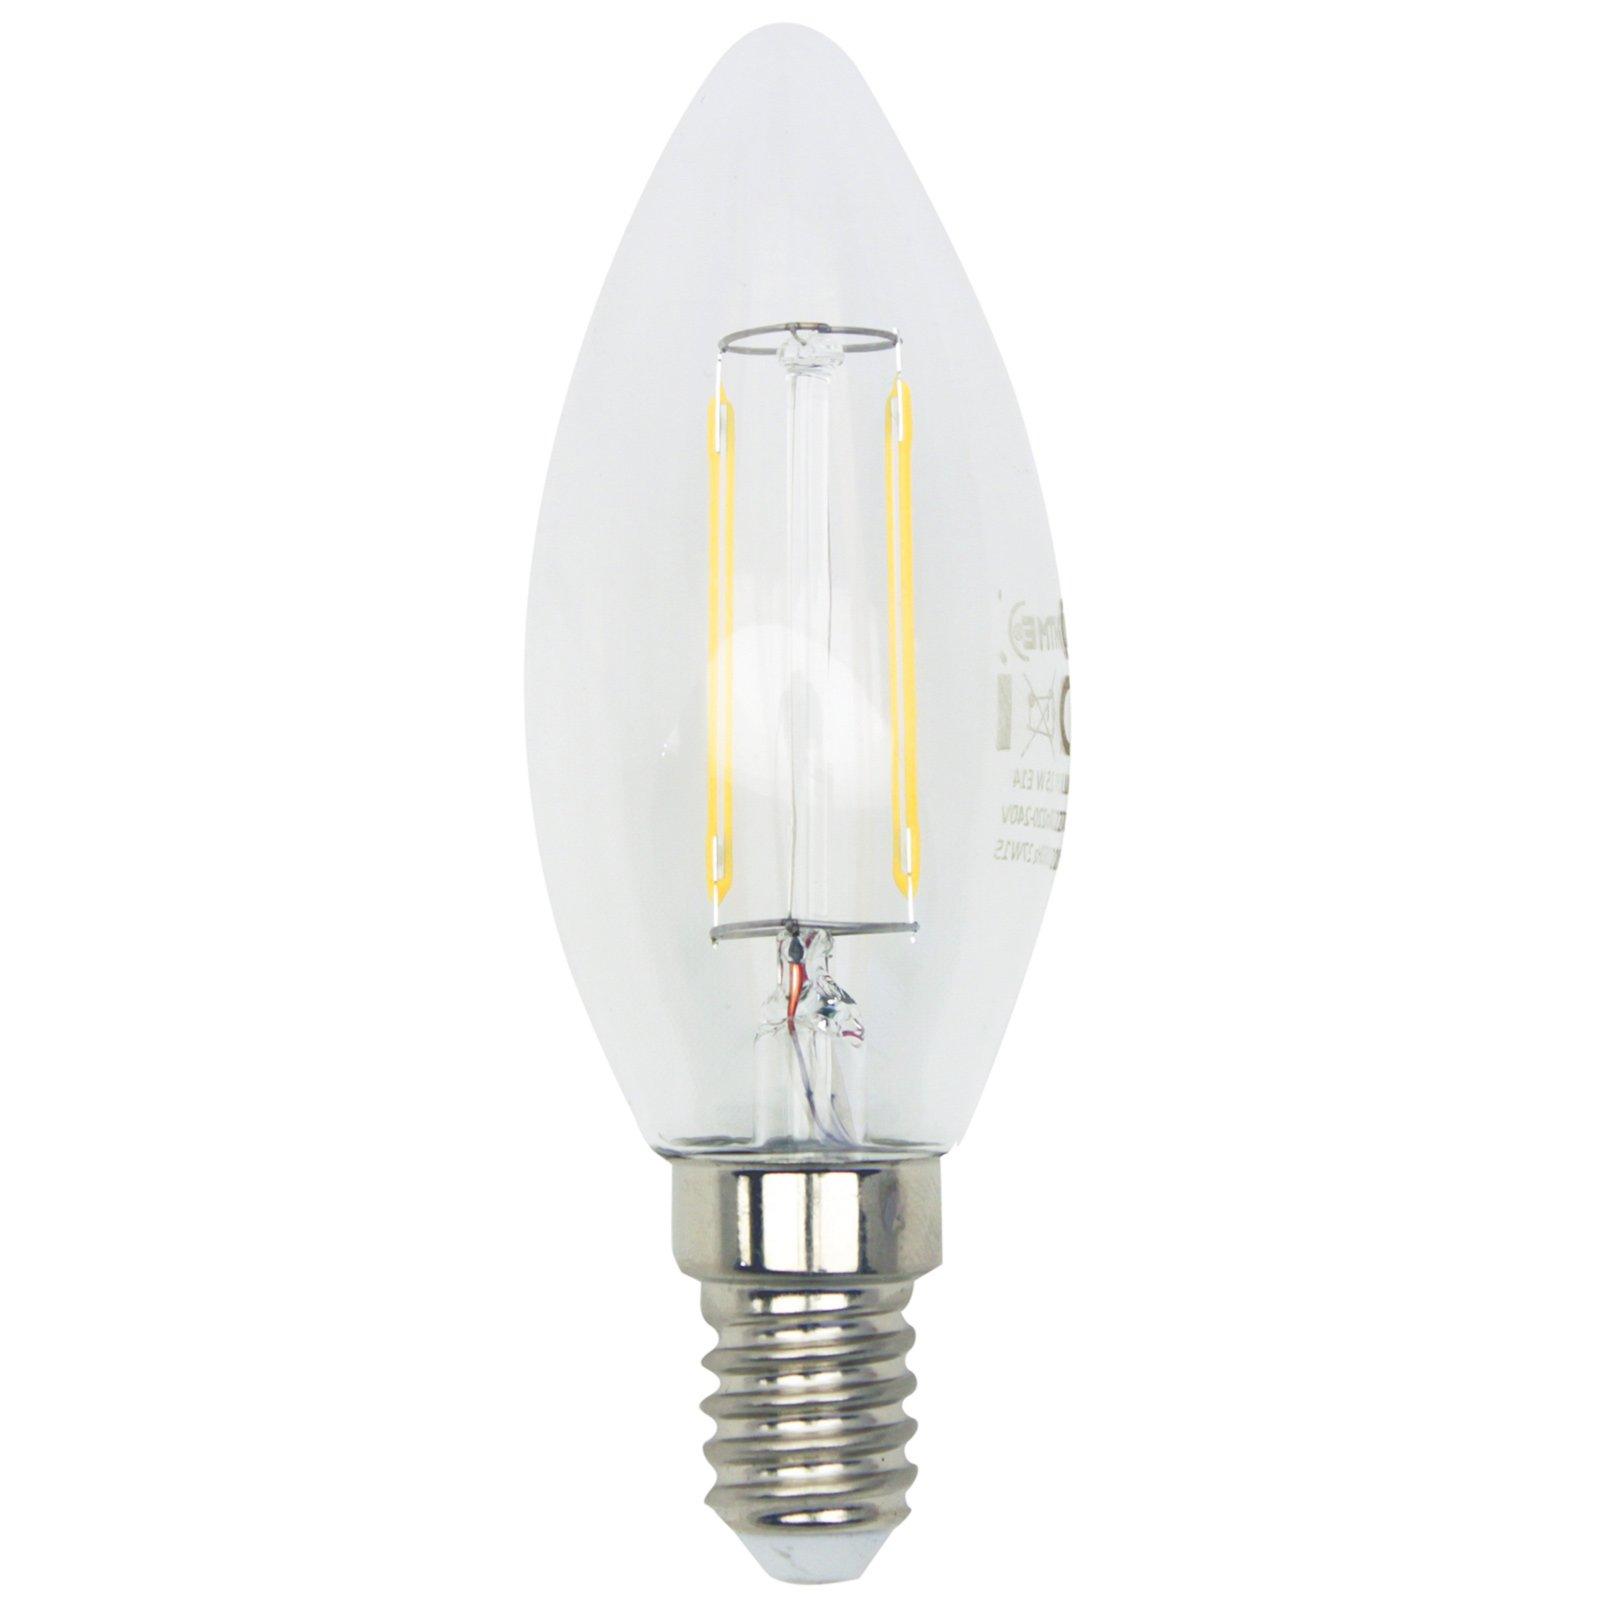 led kerzenlampe filament lightme e14 2 5 watt. Black Bedroom Furniture Sets. Home Design Ideas